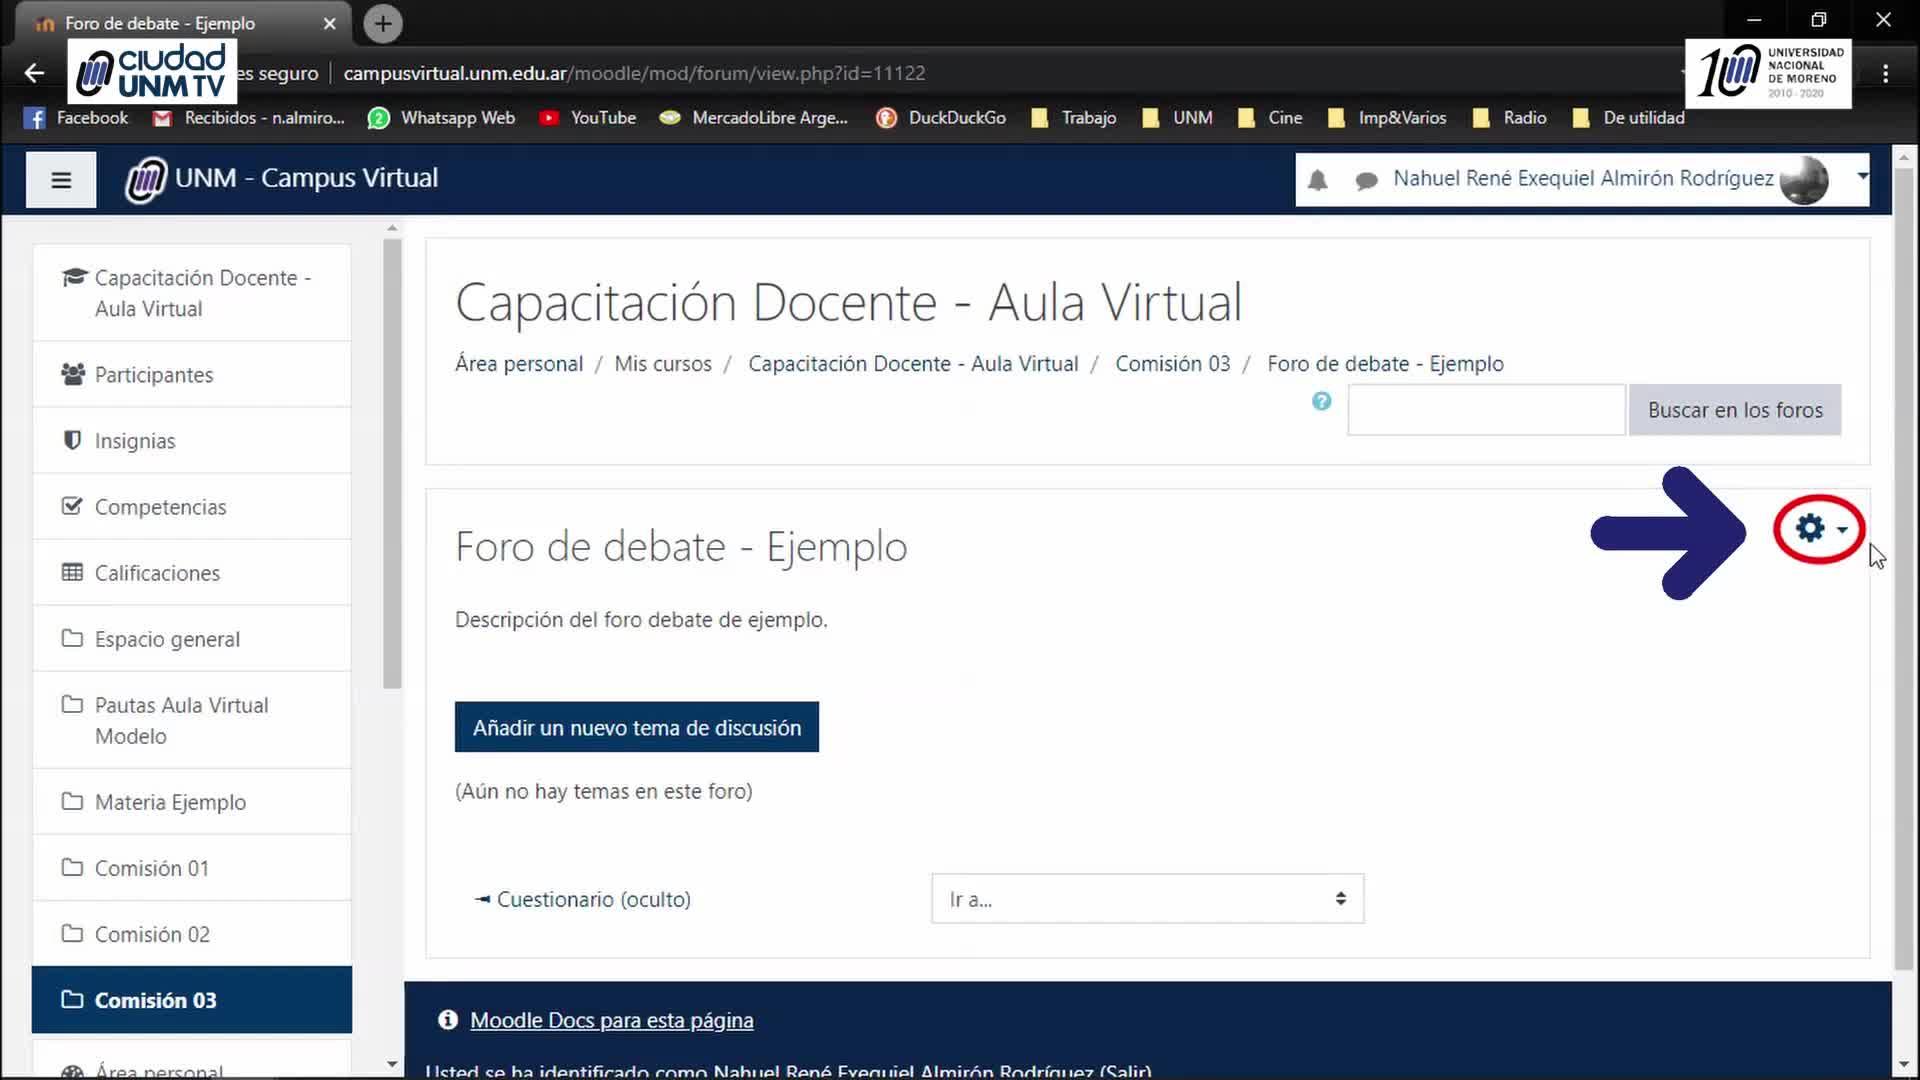 Tutoriales Campus Virtual UNM - Foro Debate